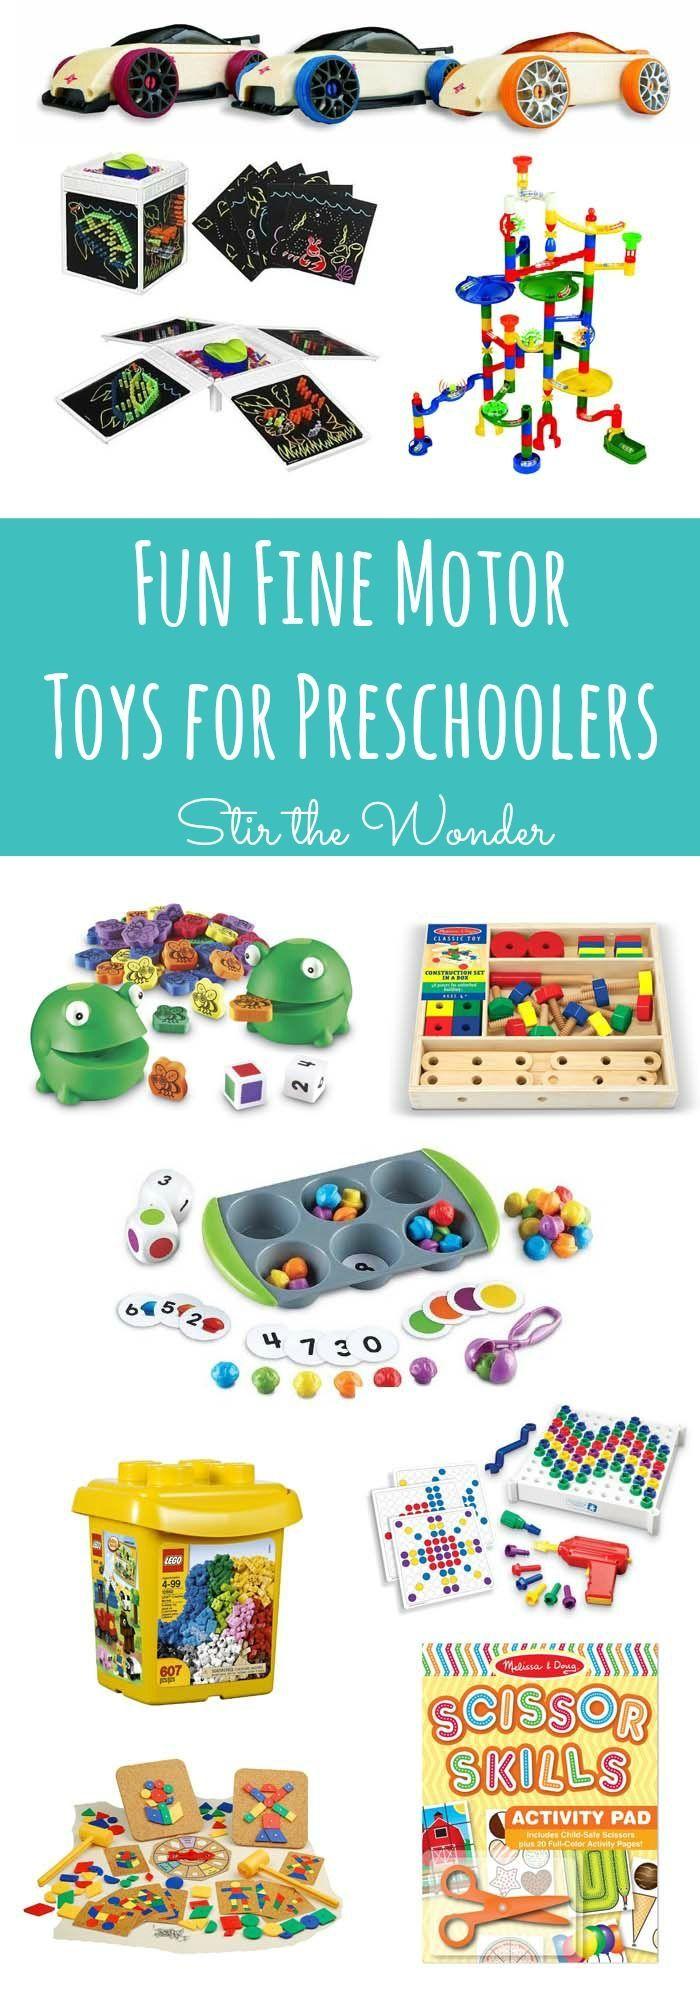 Fun Fine Motor Toys for Preschoolers